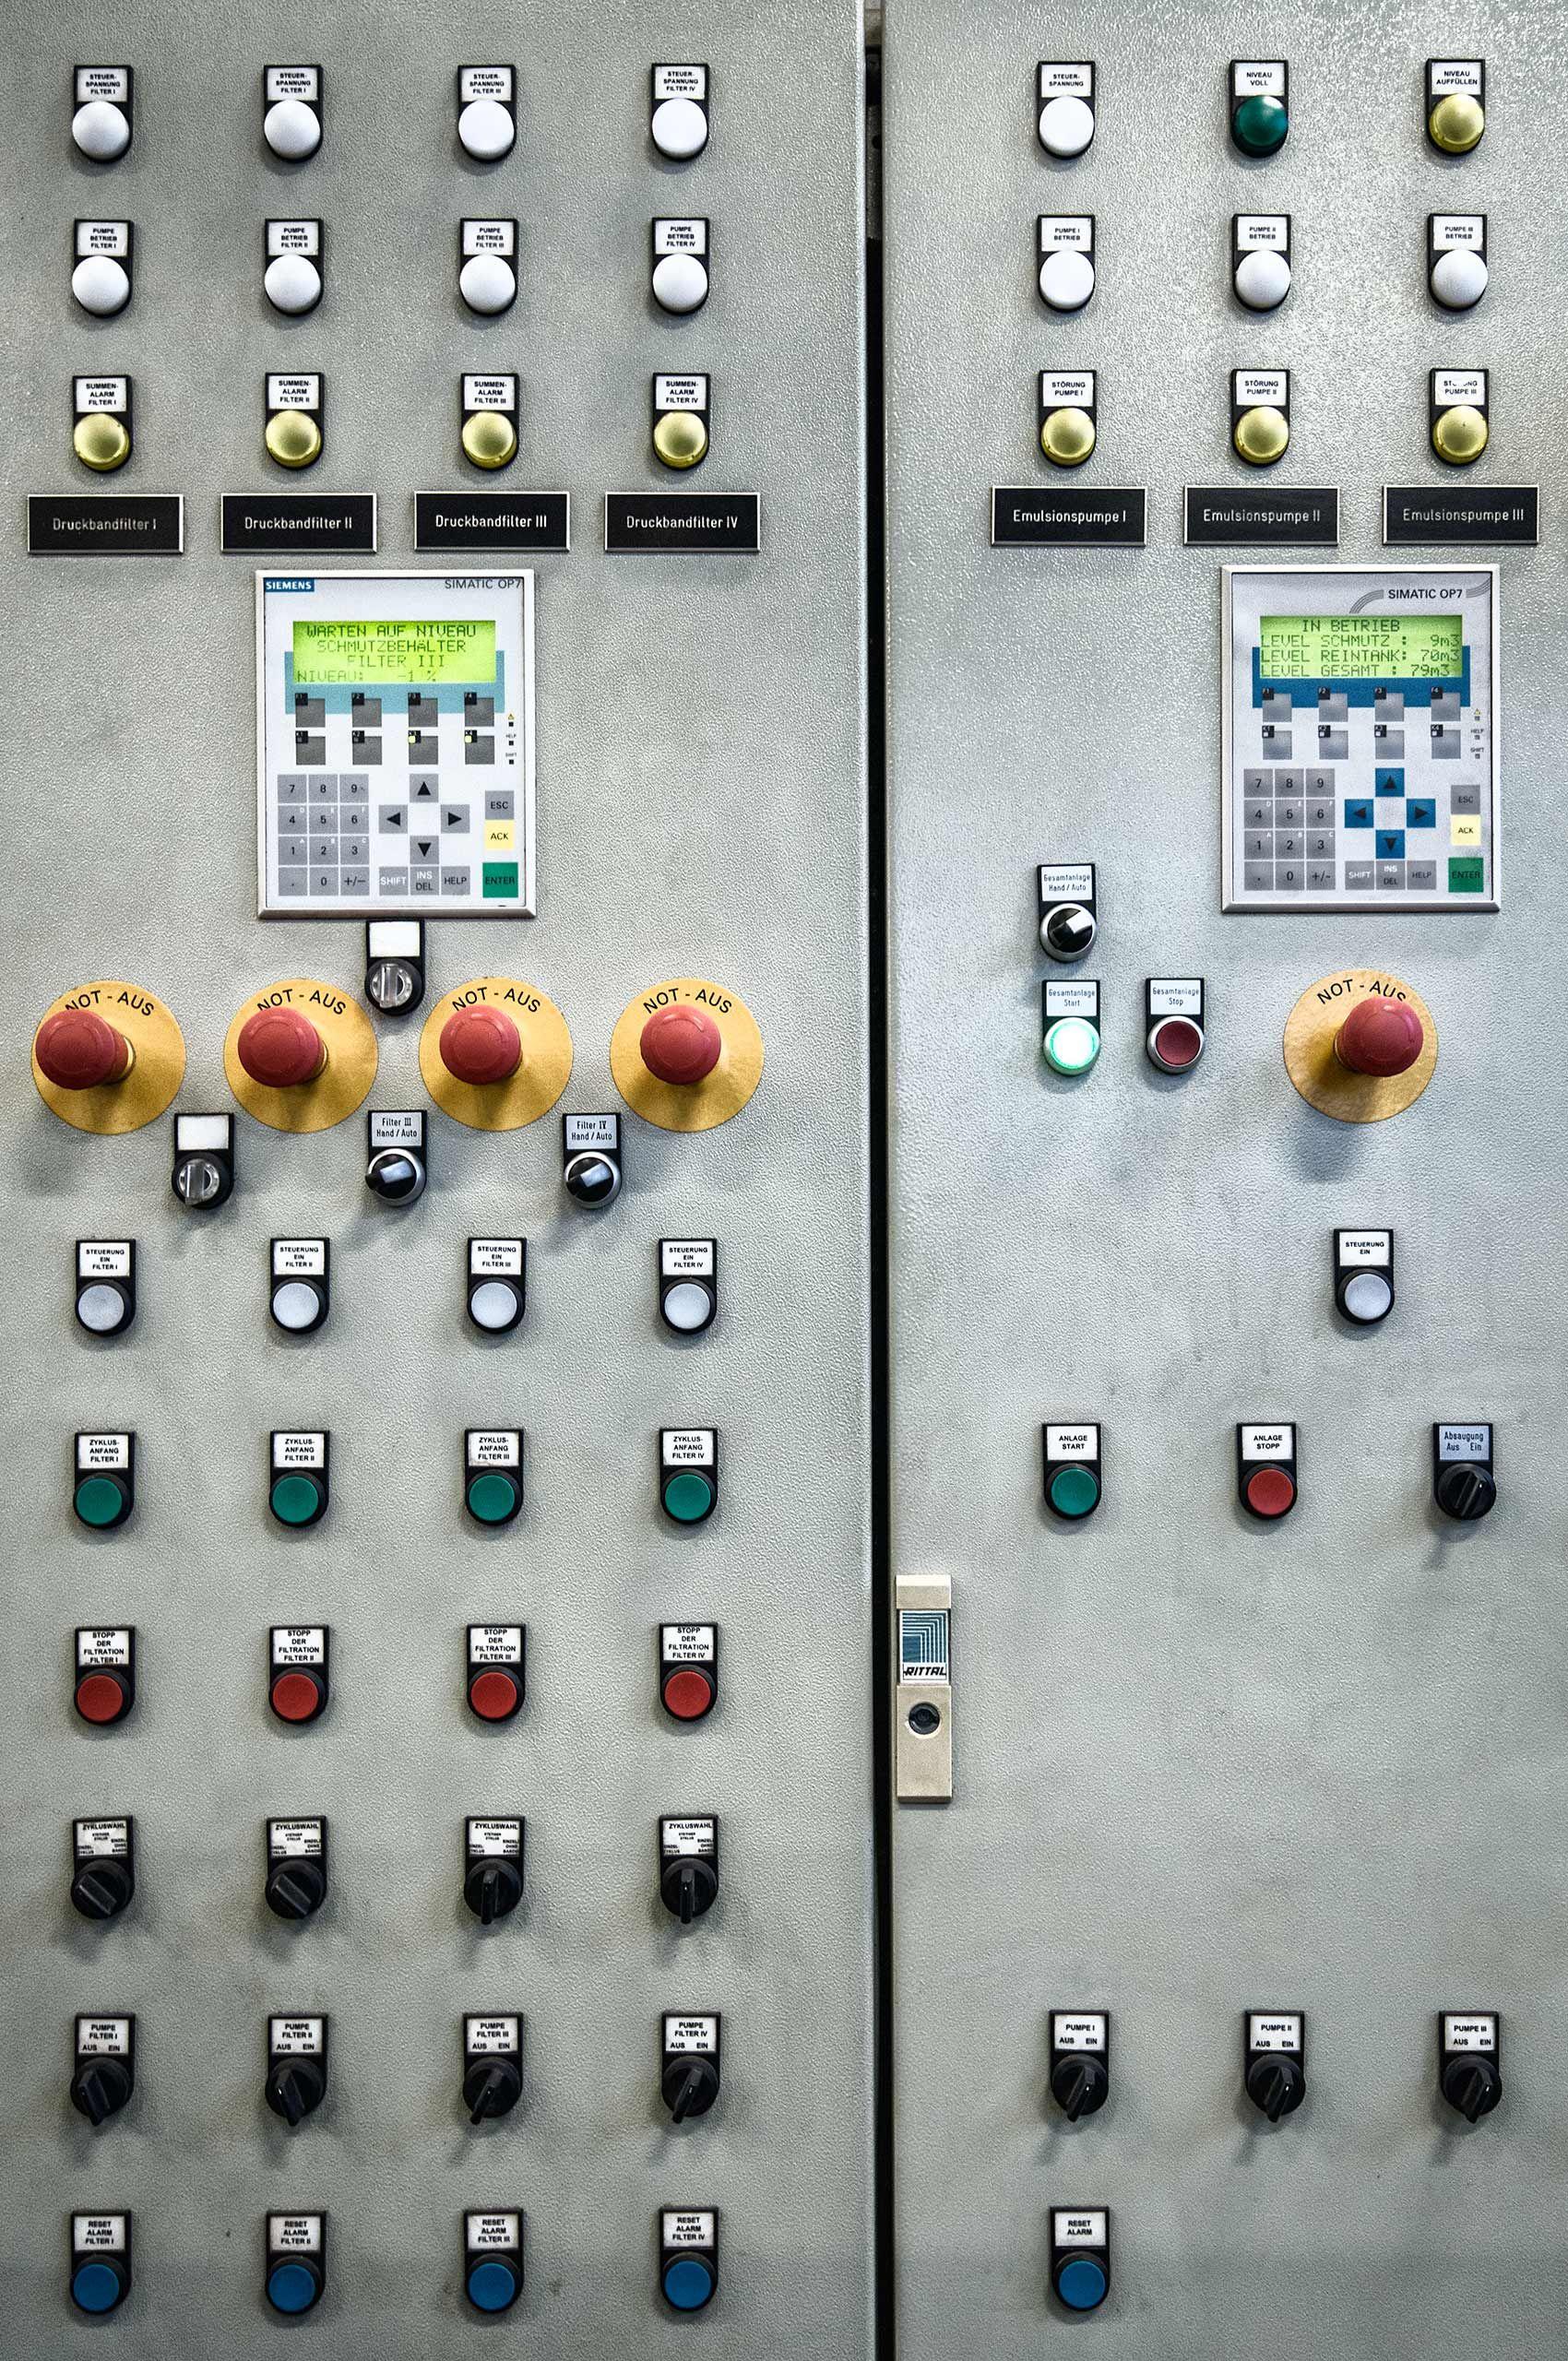 control-panel-wusthof-factory-HenrikOlundPhotography.jpg